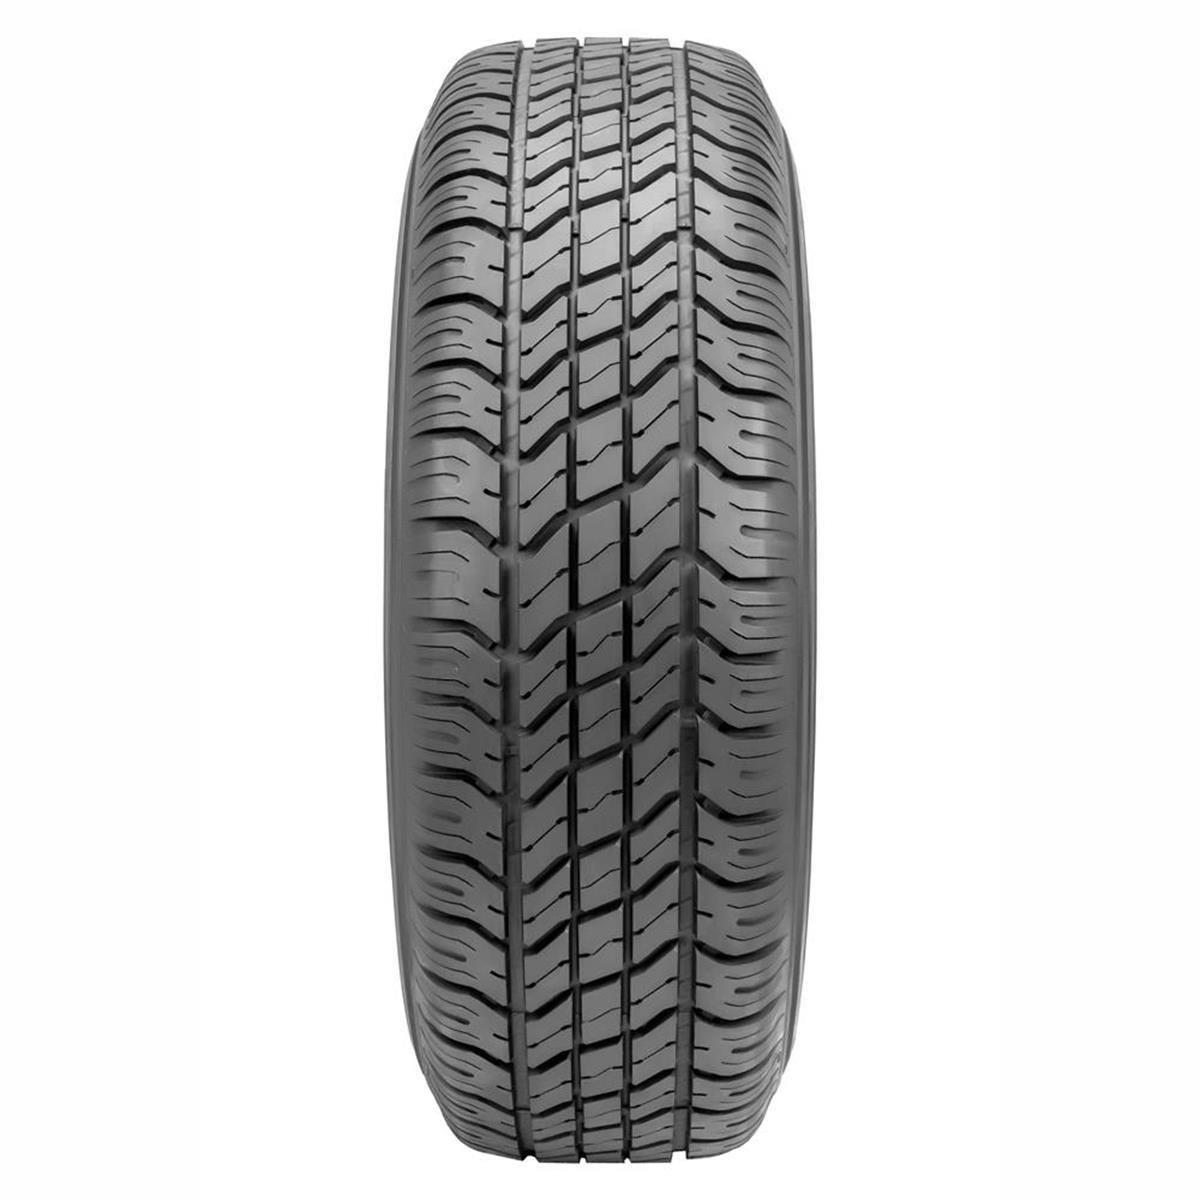 Pneu 265/70 R 17 - Formula S/T 112S - Pirelli